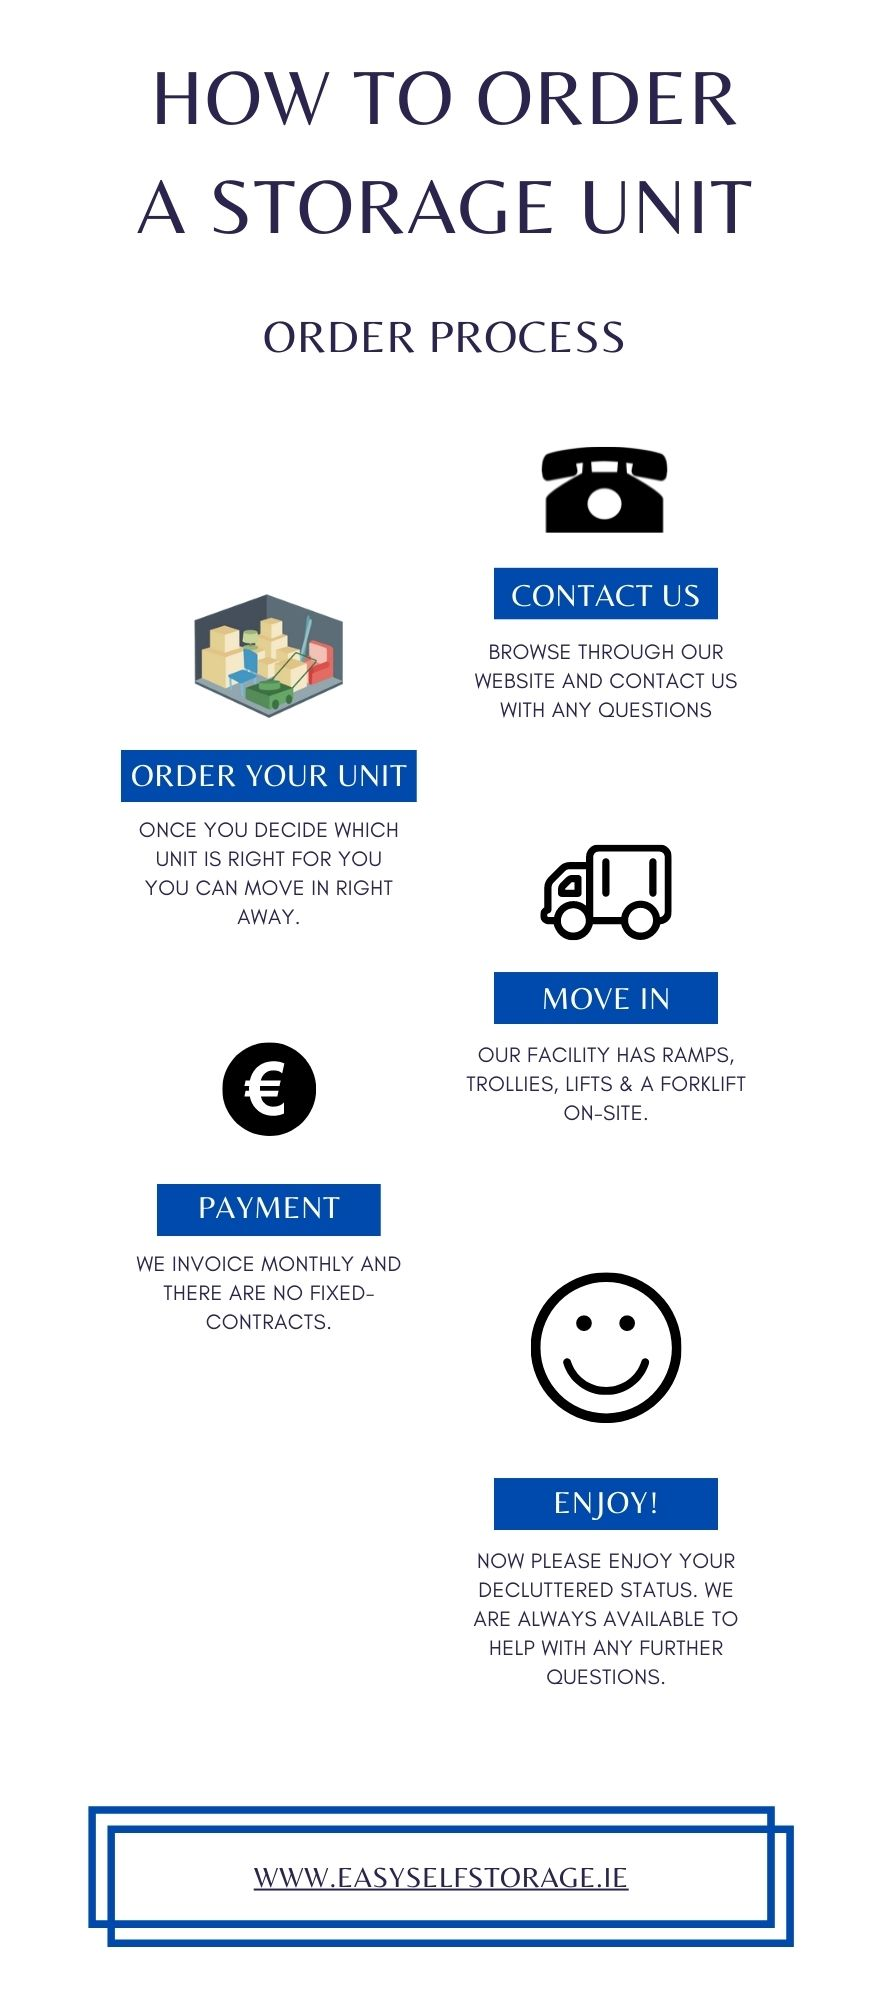 Easy Self Storage Order Process